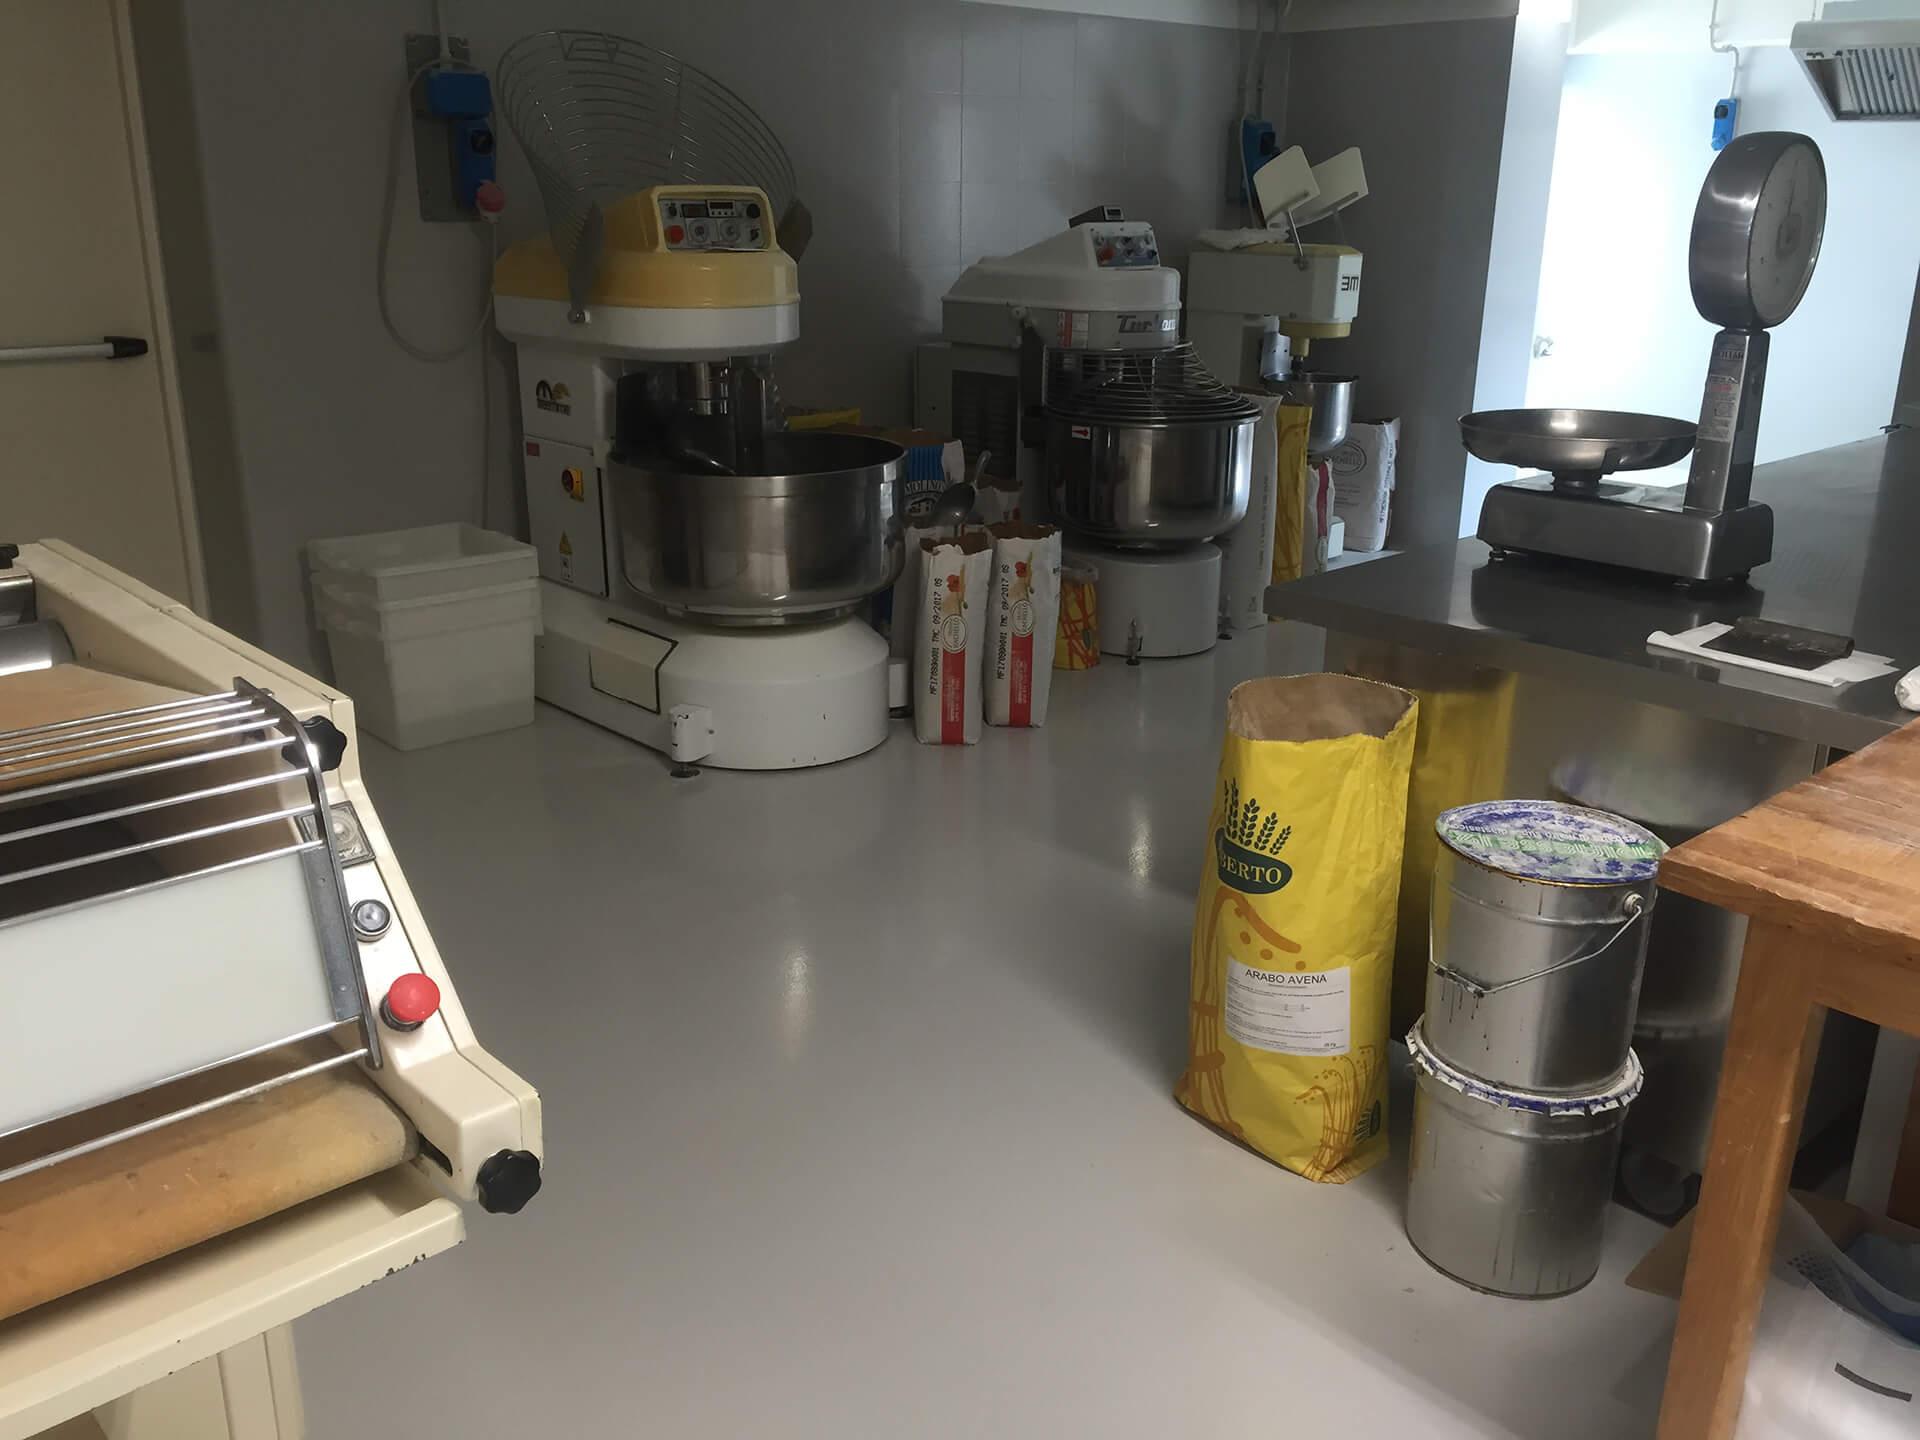 verniciatura a resina pavimento azienda alimentare